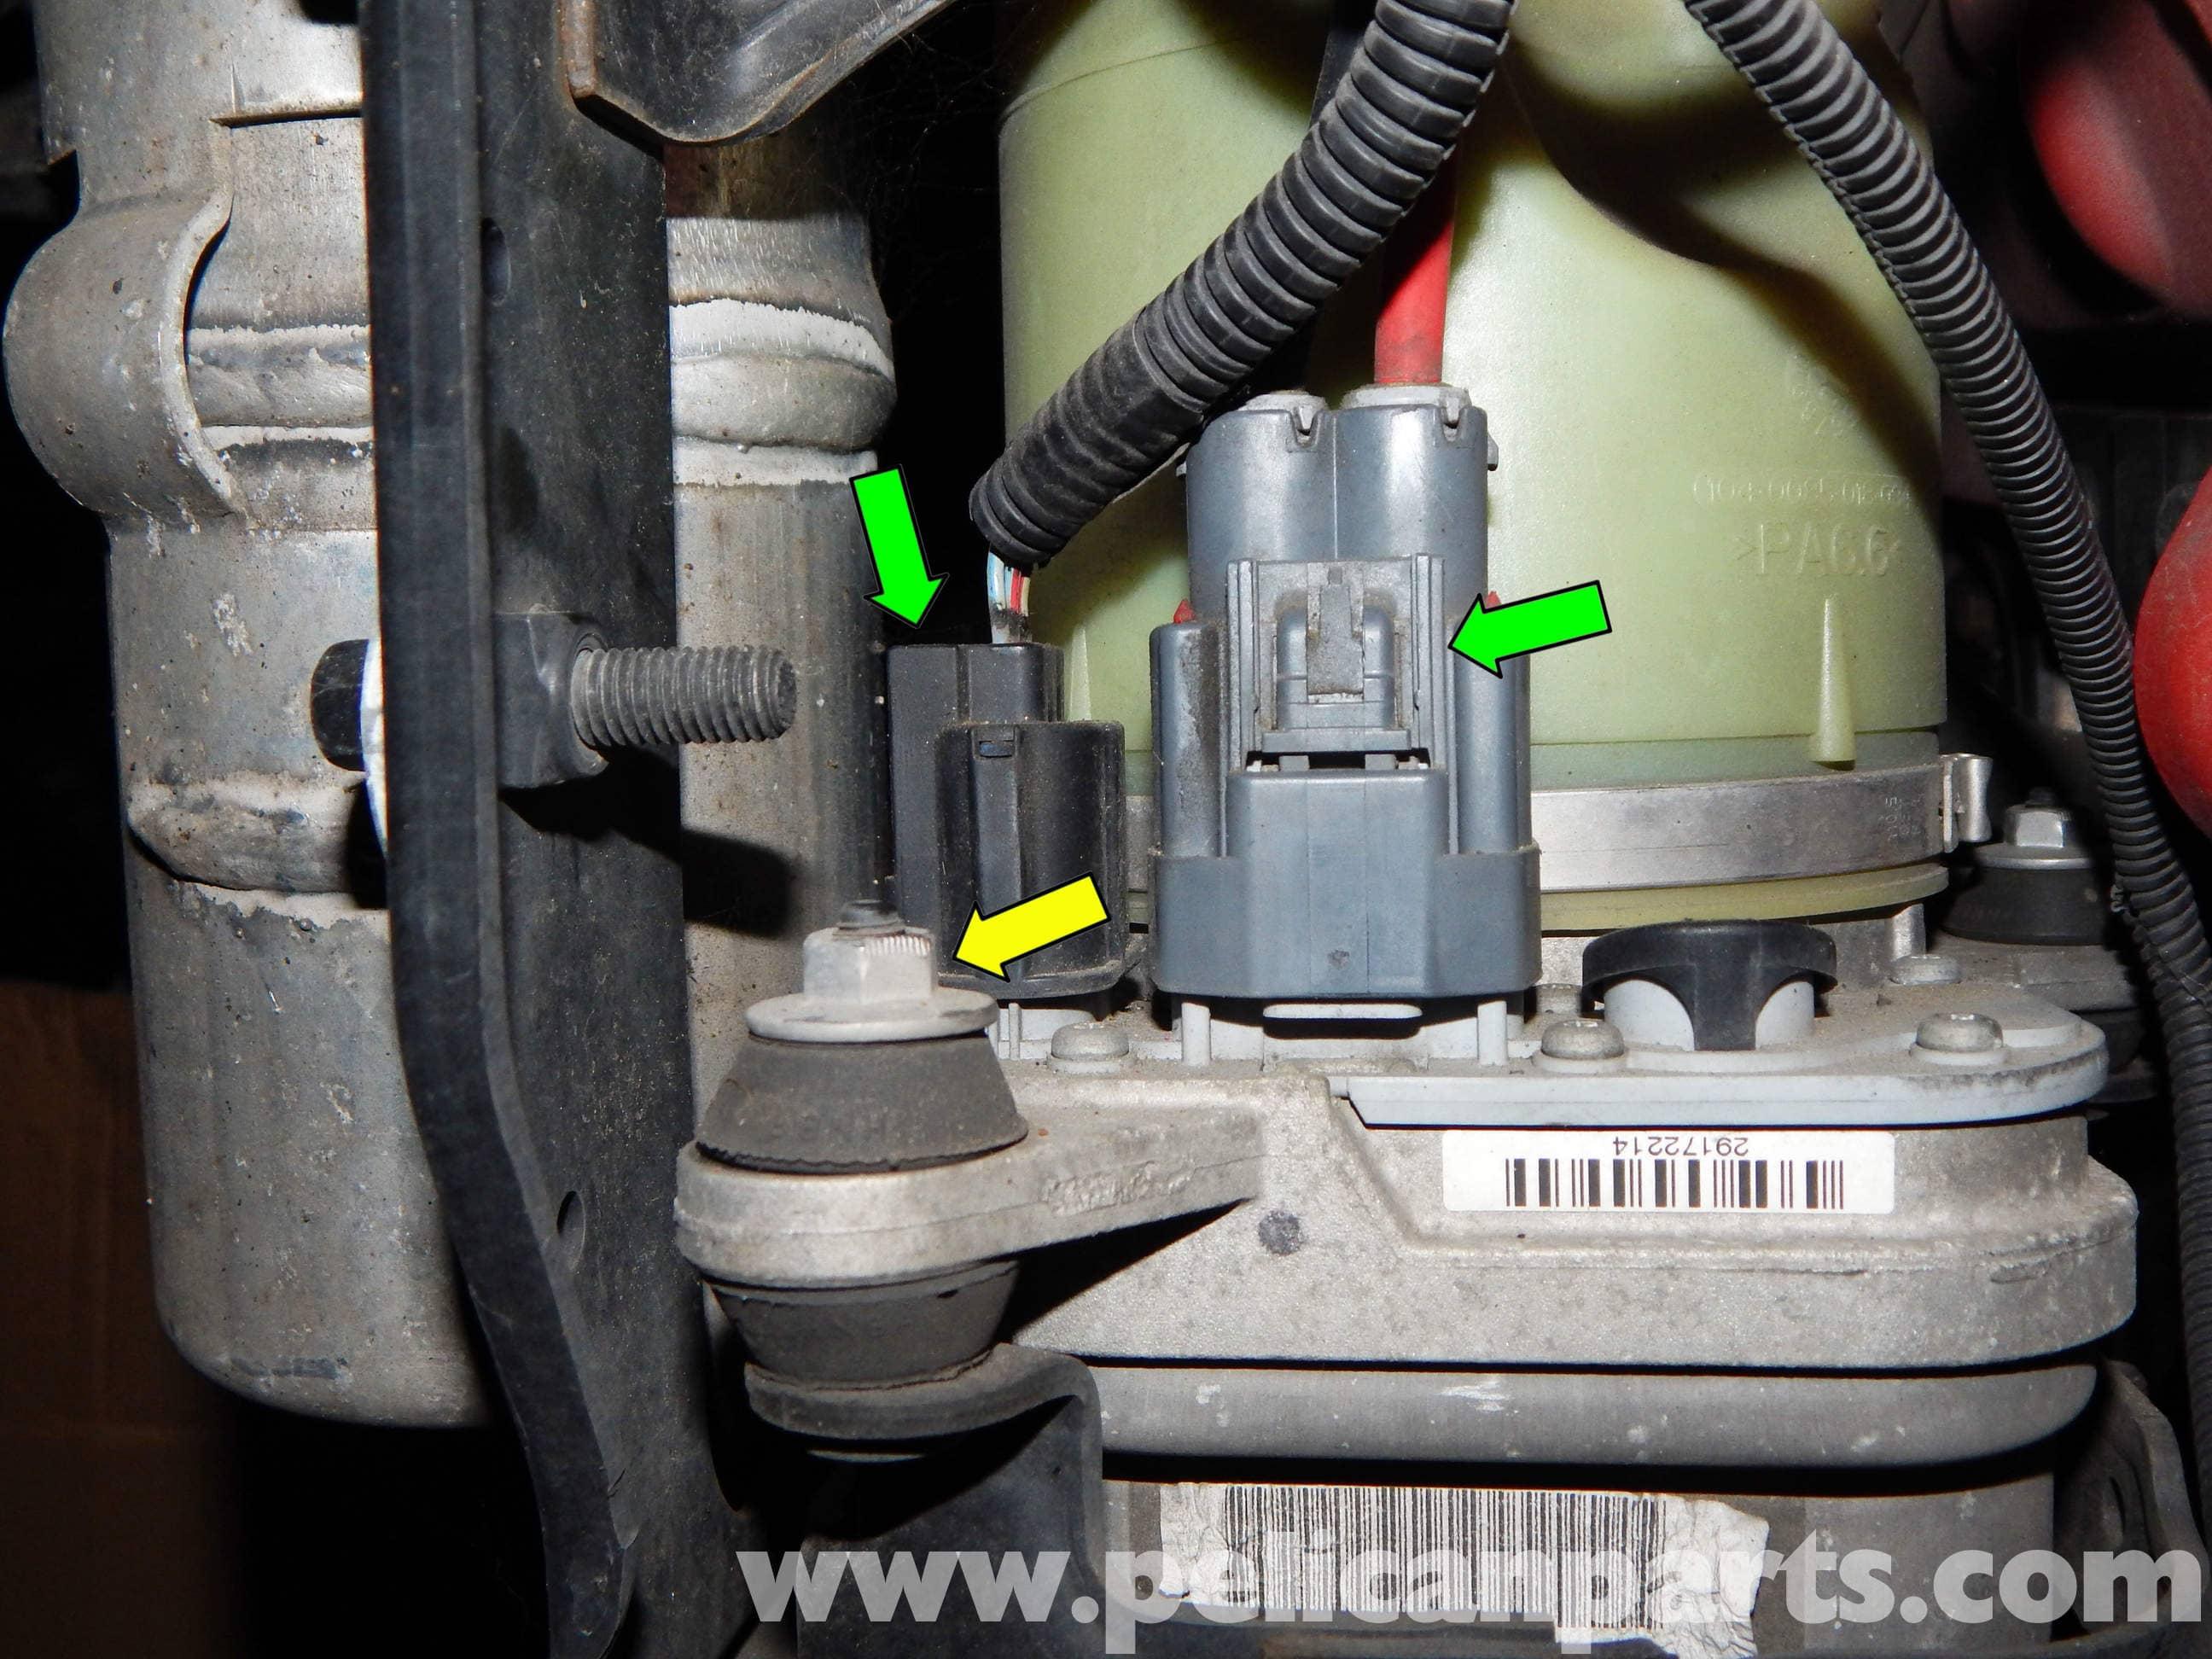 Volvo C30 Power Steering Pump Replacement C30 T5 2008